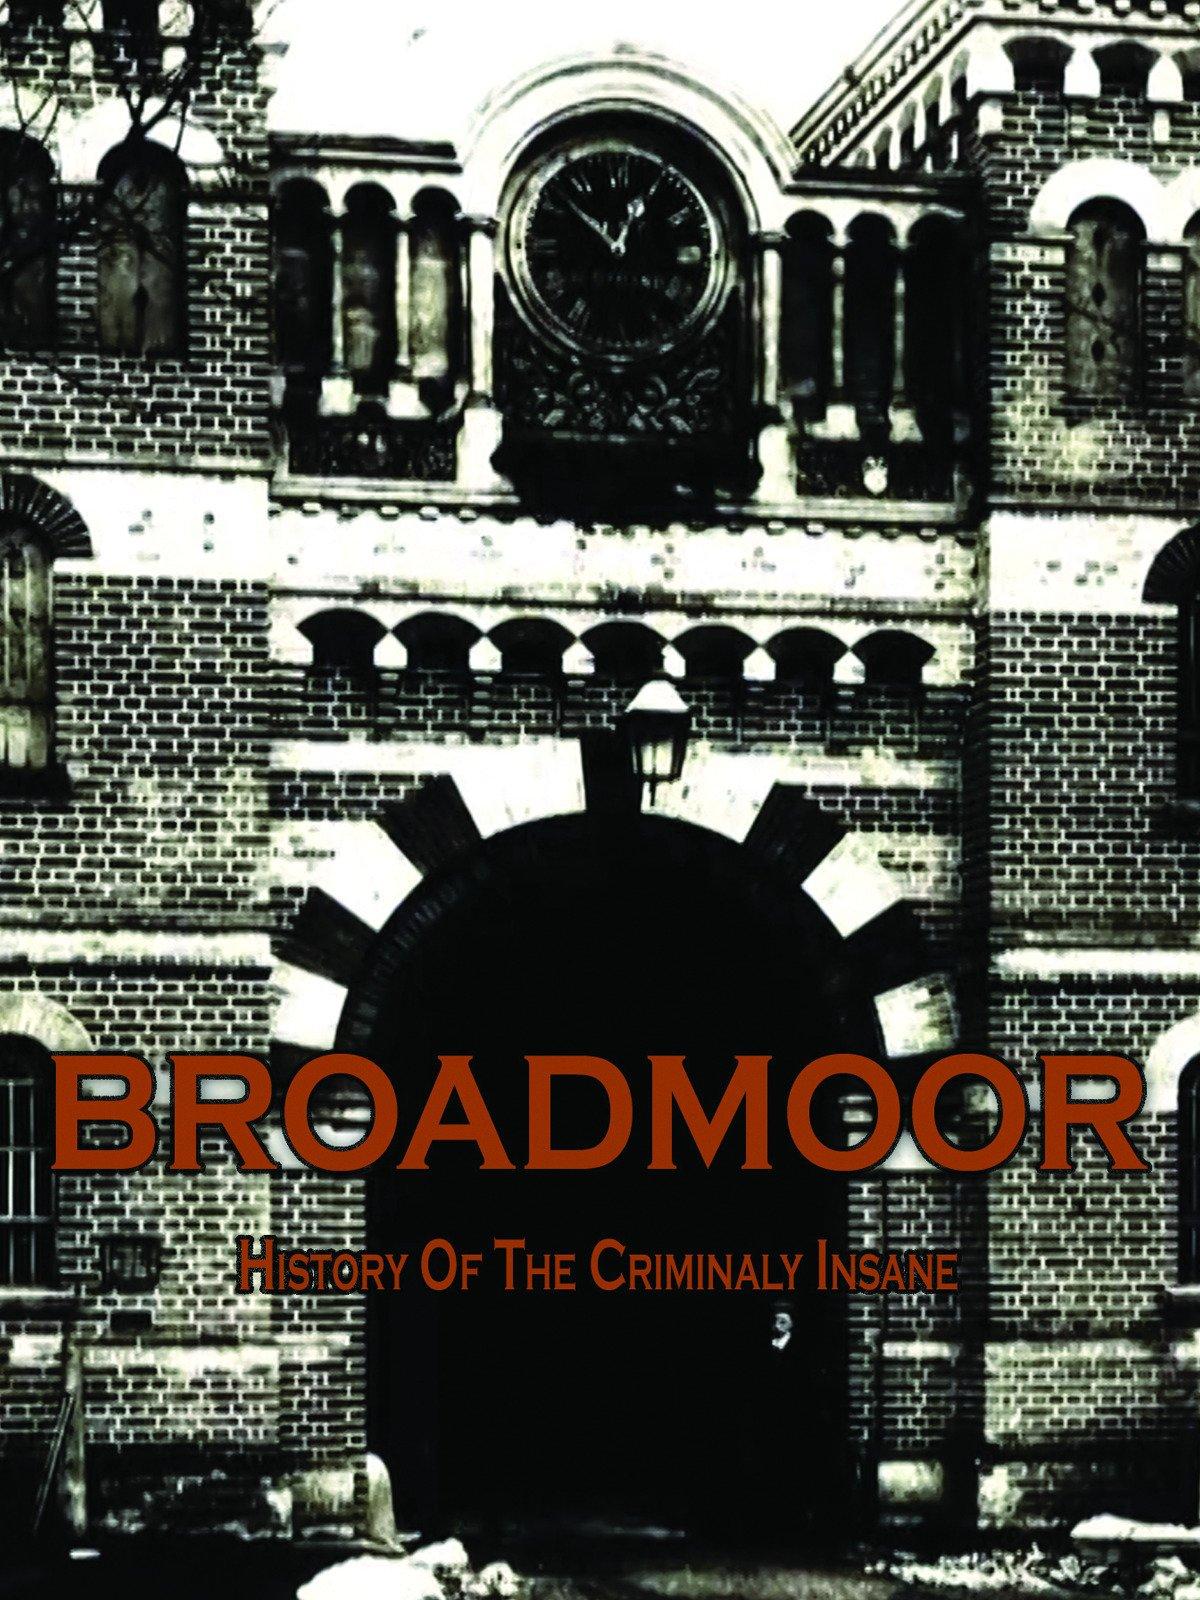 Broadmoor: A History of the Criminally Insane